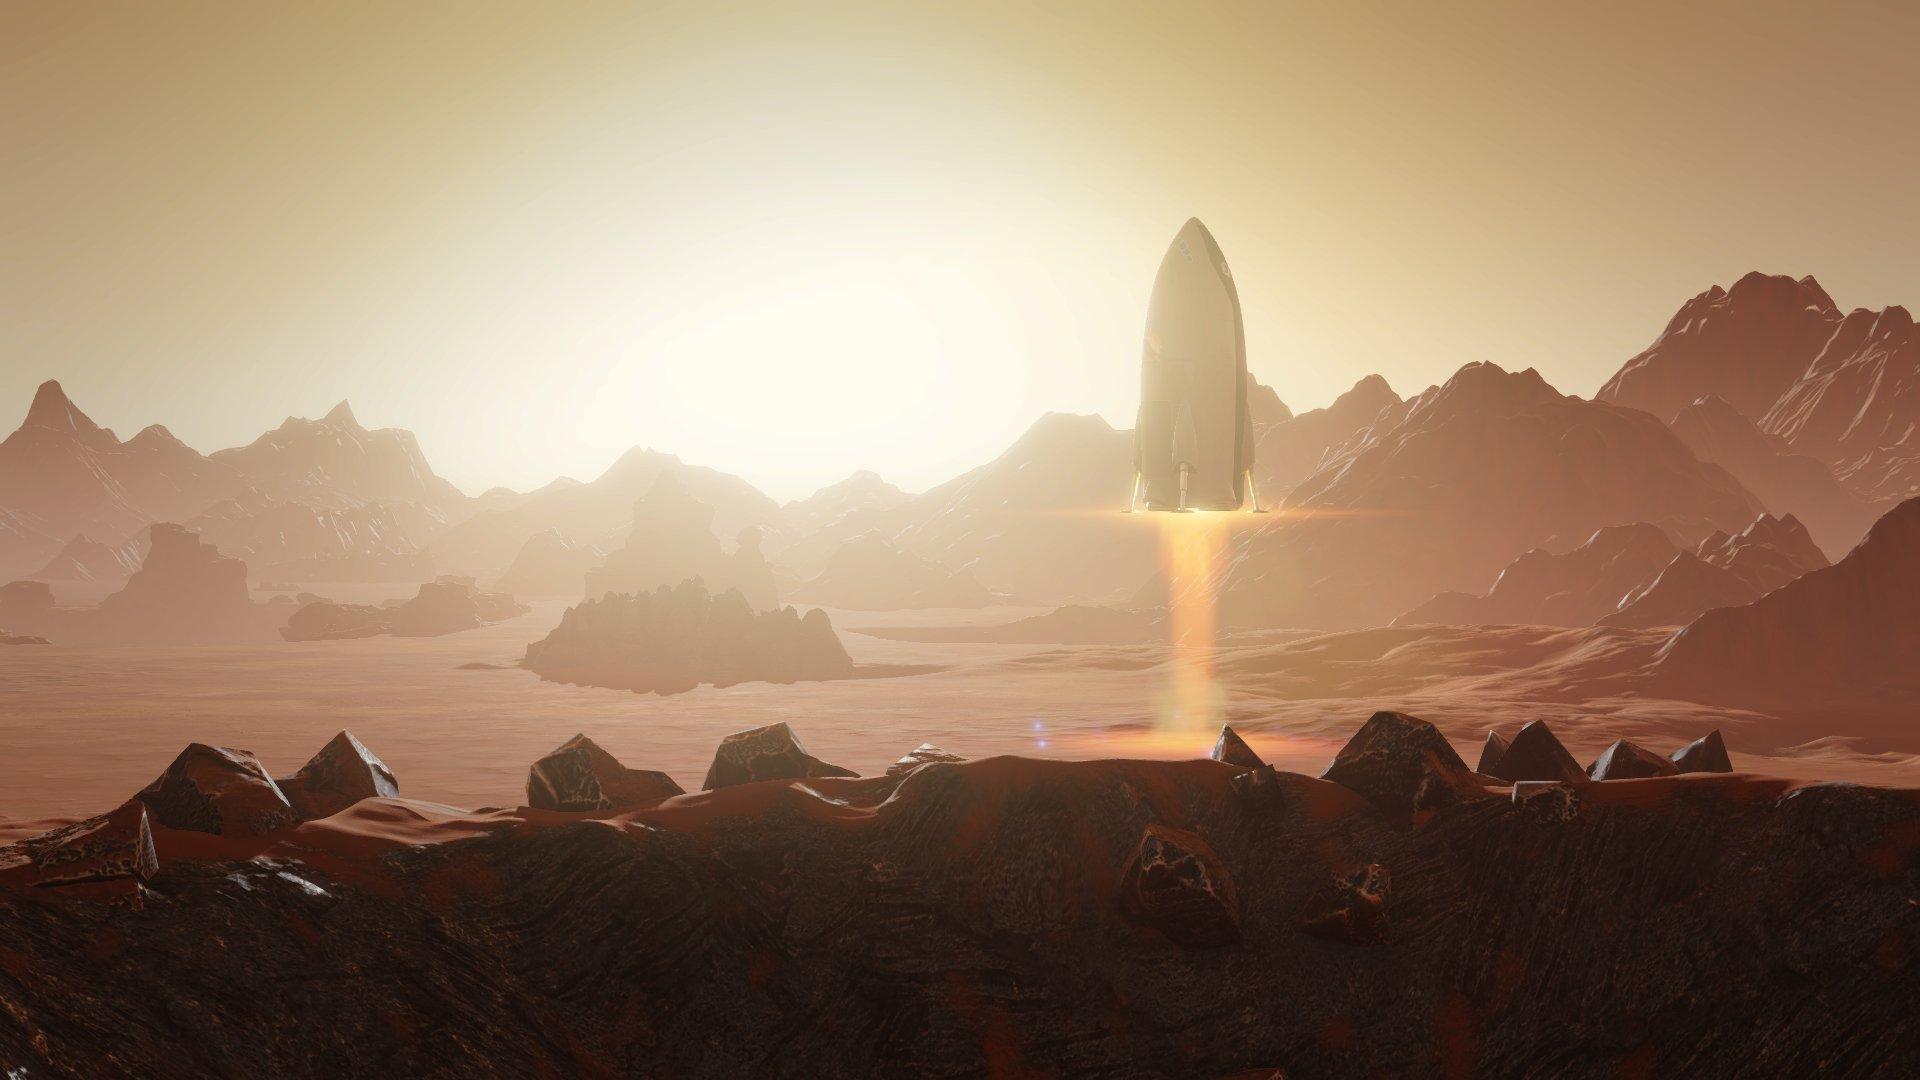 mars human landing site - photo #36